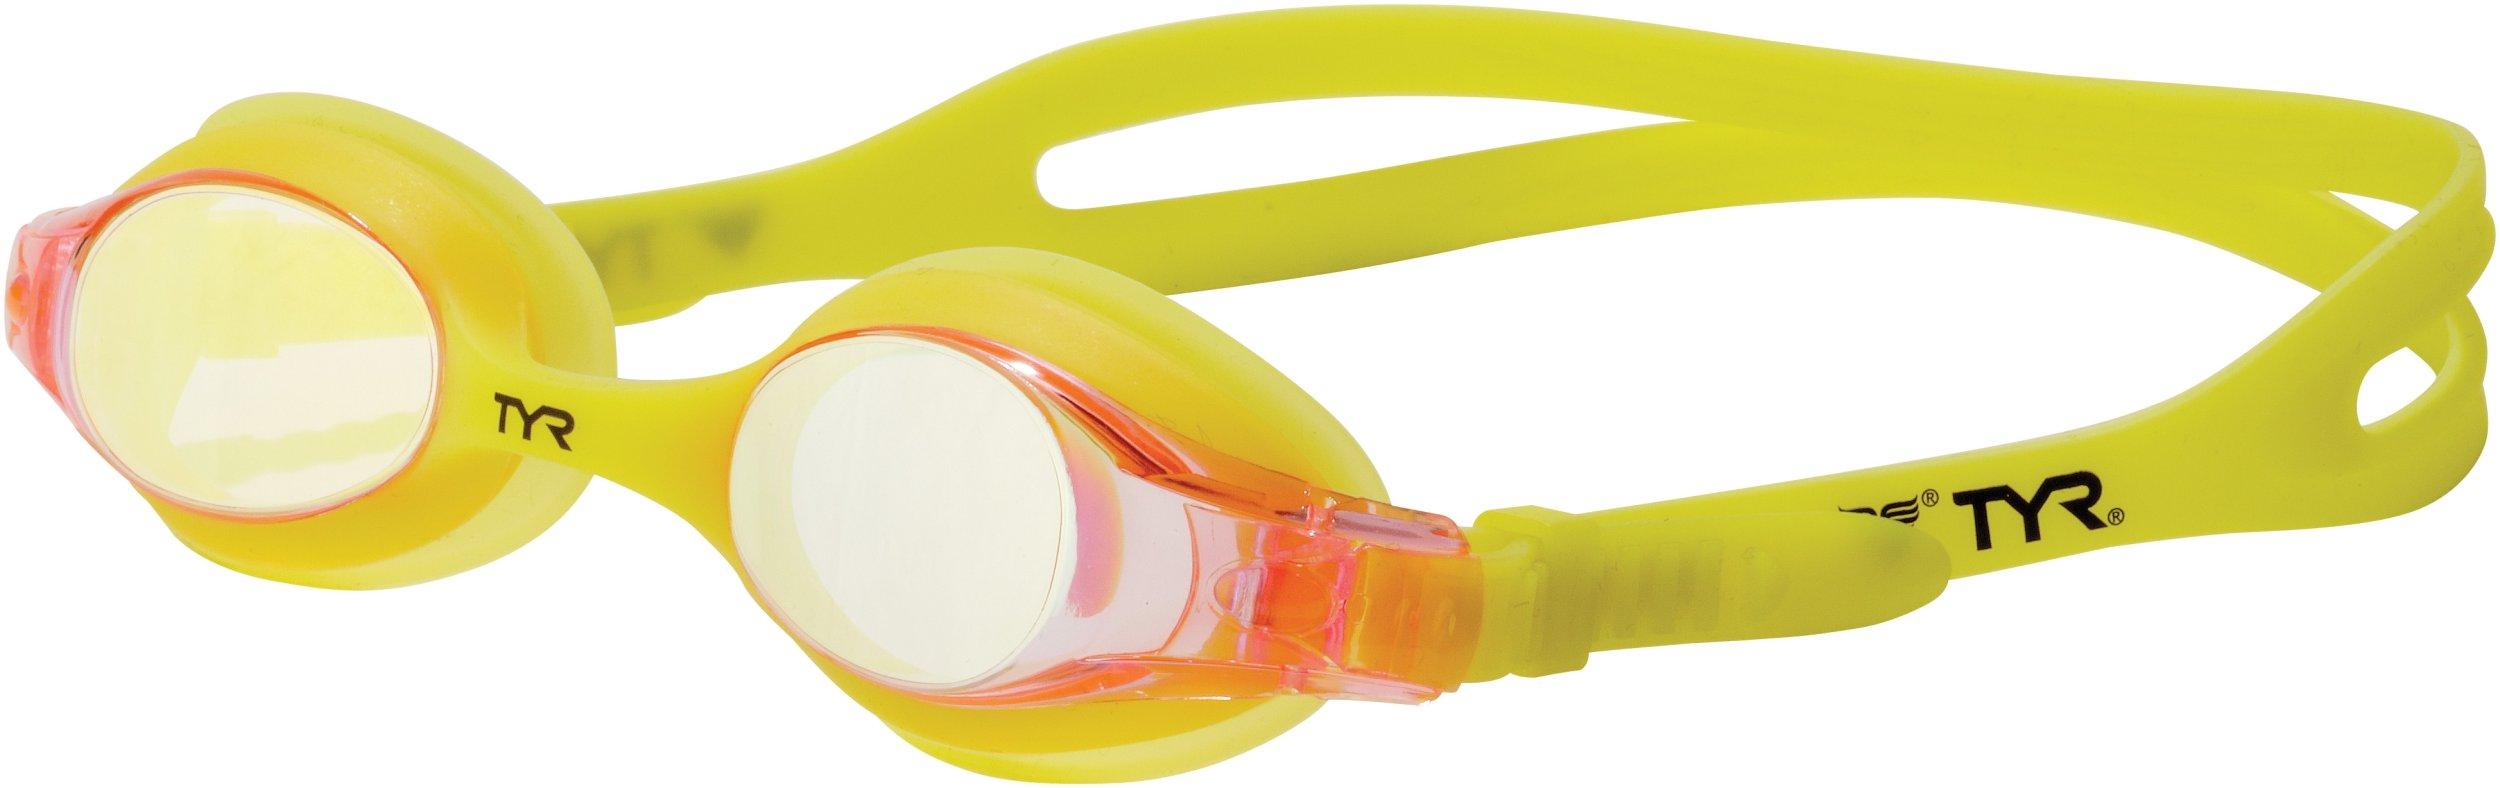 TYR Swimple Youth Metallized Goggle (Pink Lemonade)